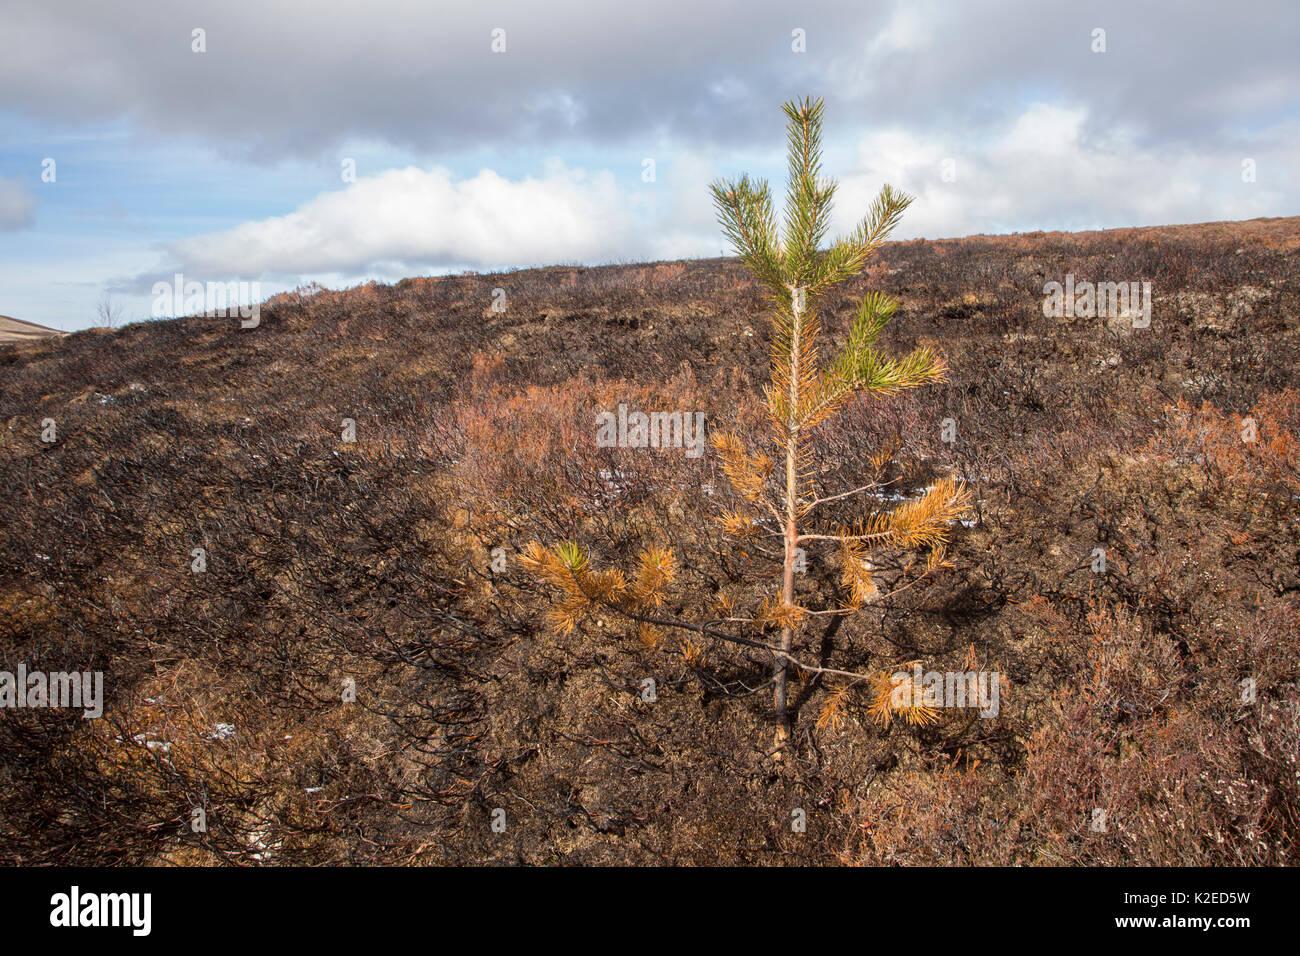 Pine sapling scorched during muirburn / burn on upland grouse shooting moor, Scotland, UK, April 2016. - Stock Image